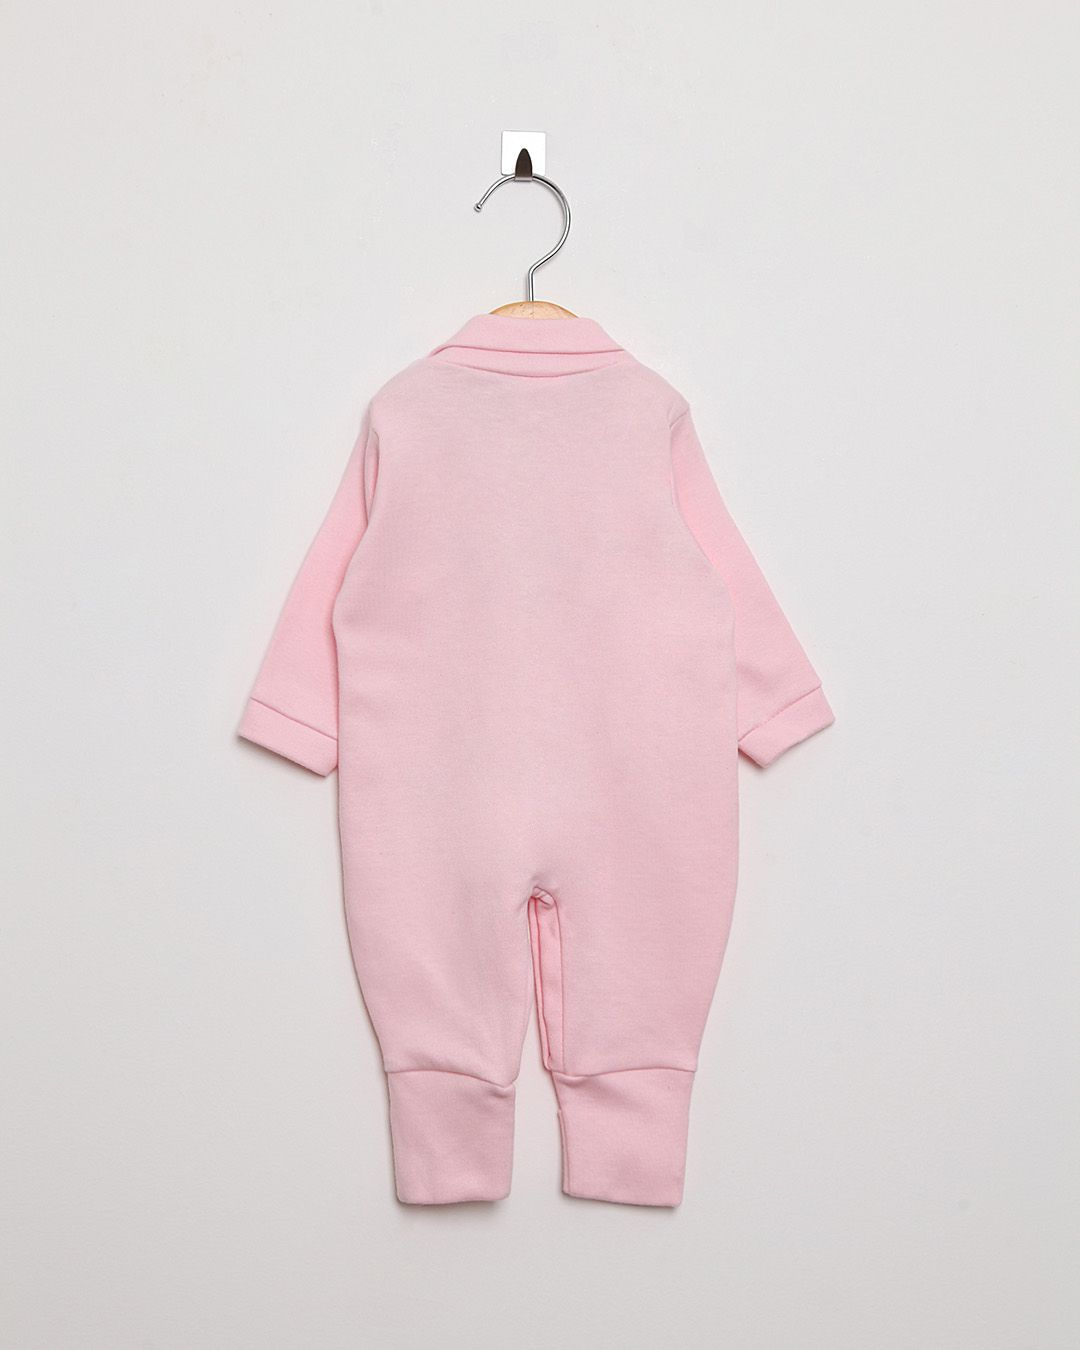 Macacão Bebê Manga Longa Menina Pé Reversível Rosa Bebê